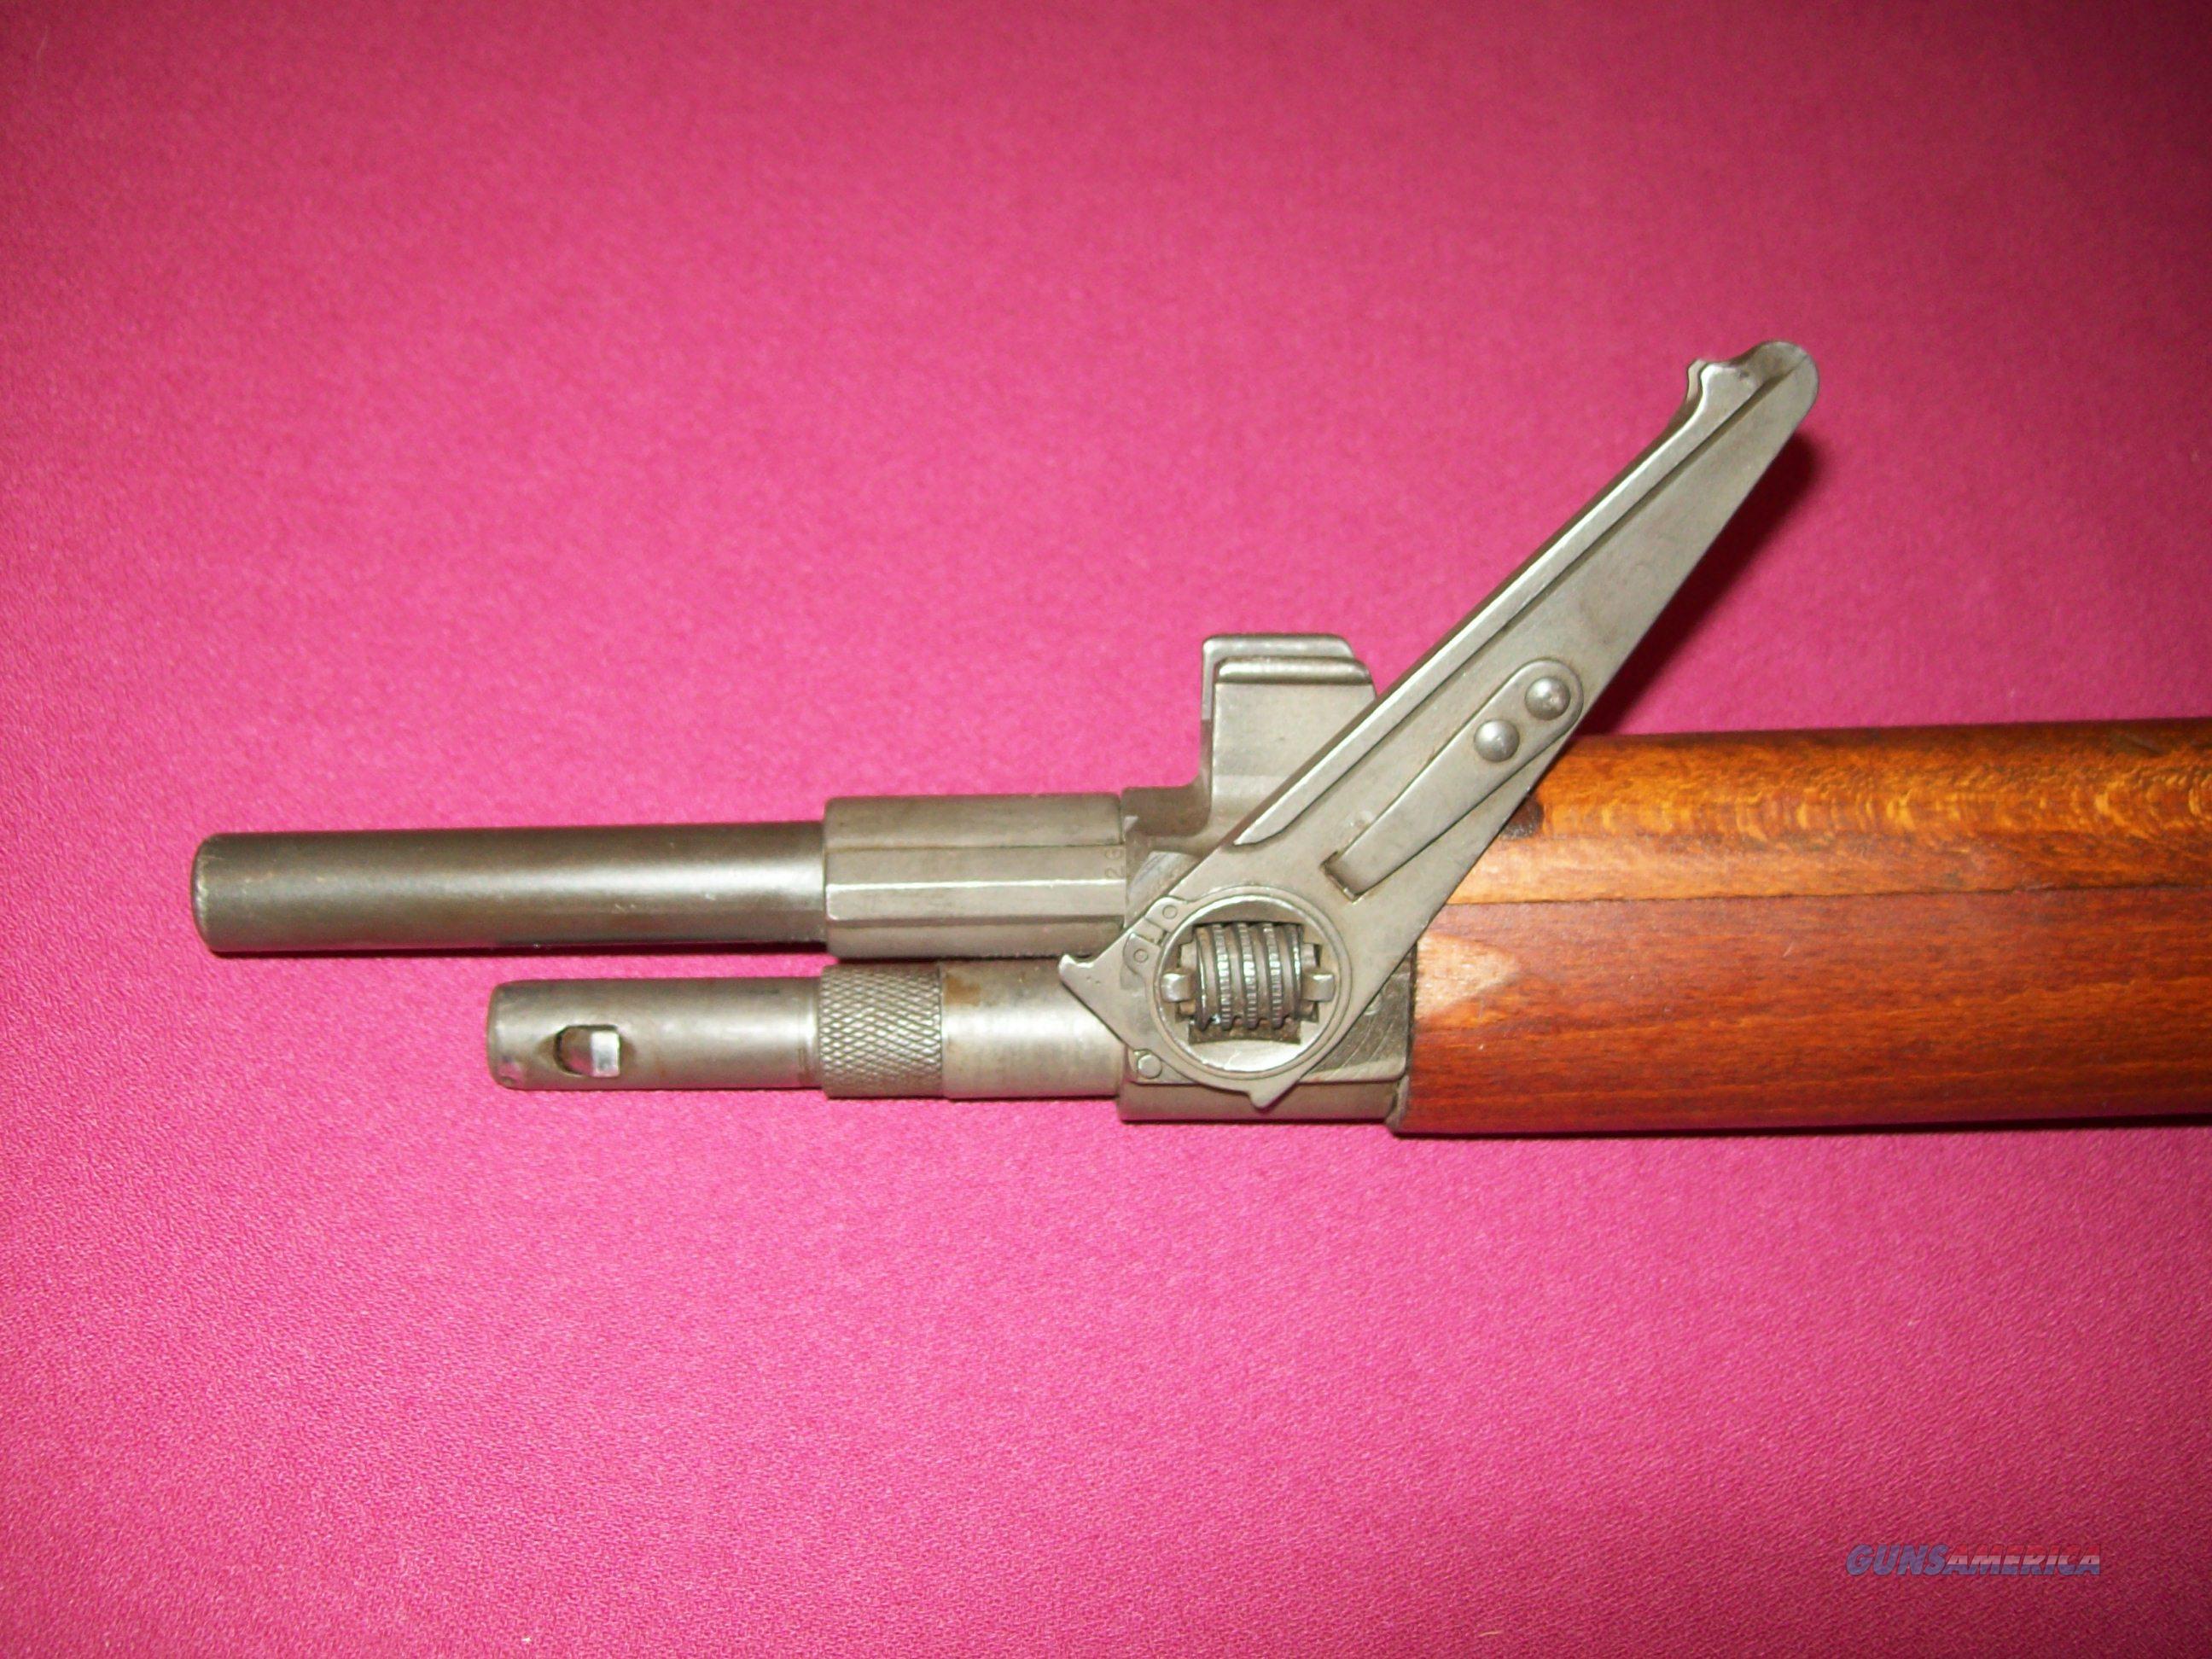 Mas 49/56 - Milsurp [Rifles] - Long Island Firearms